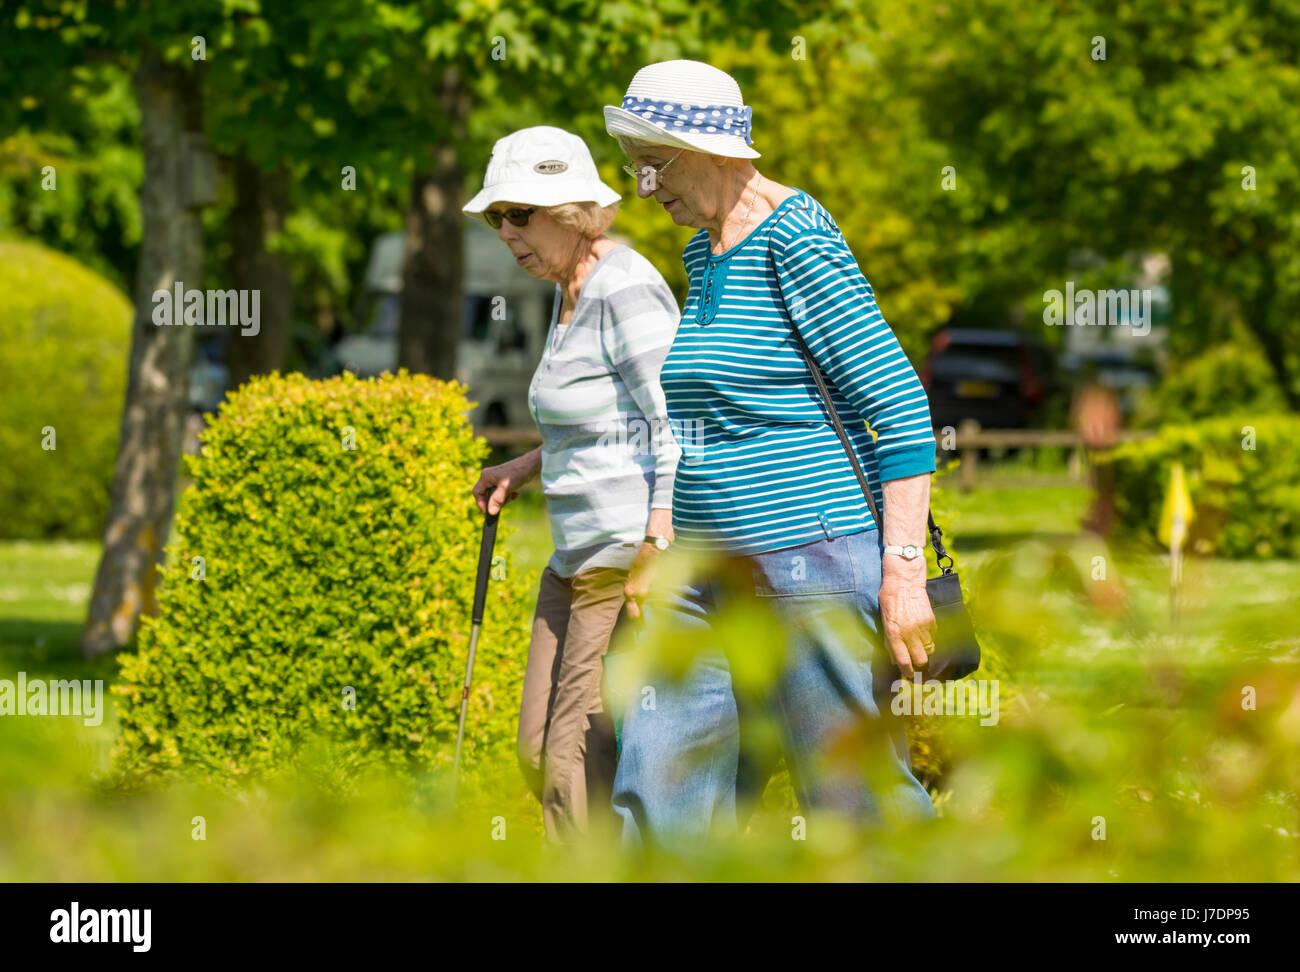 Elderly women taking a summer walk through a park. - Stock Image